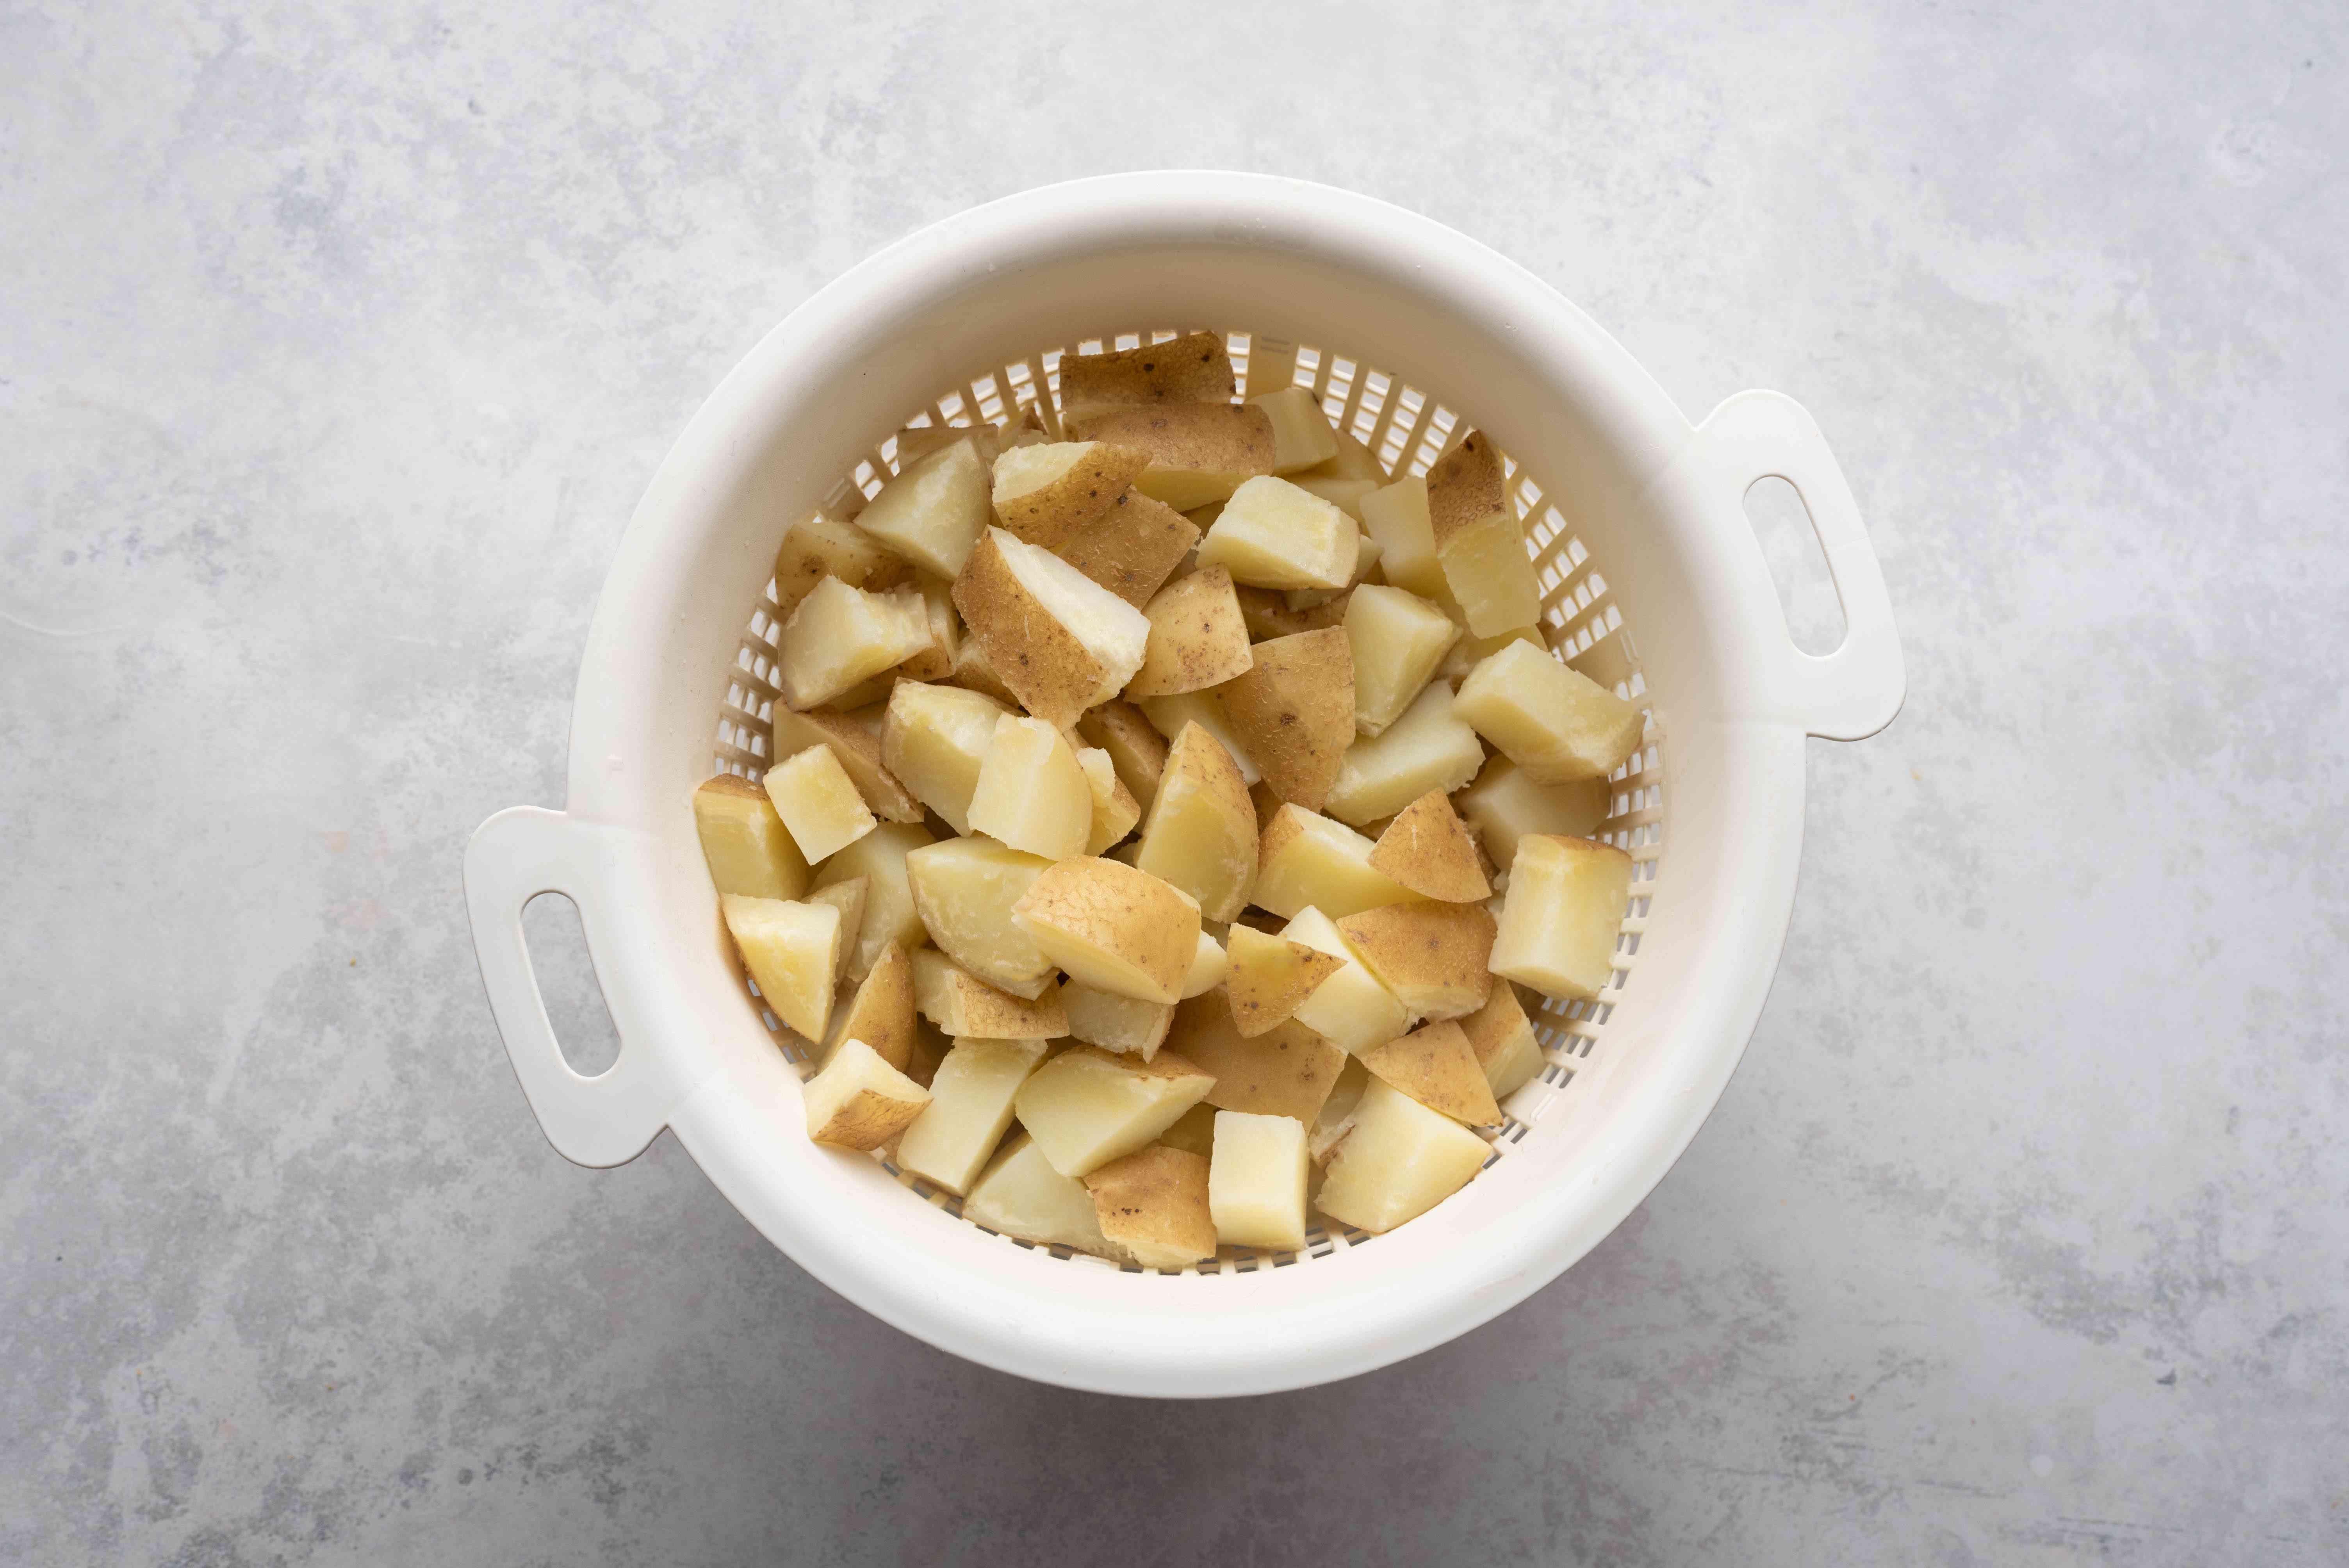 Drain potatoes in a colander